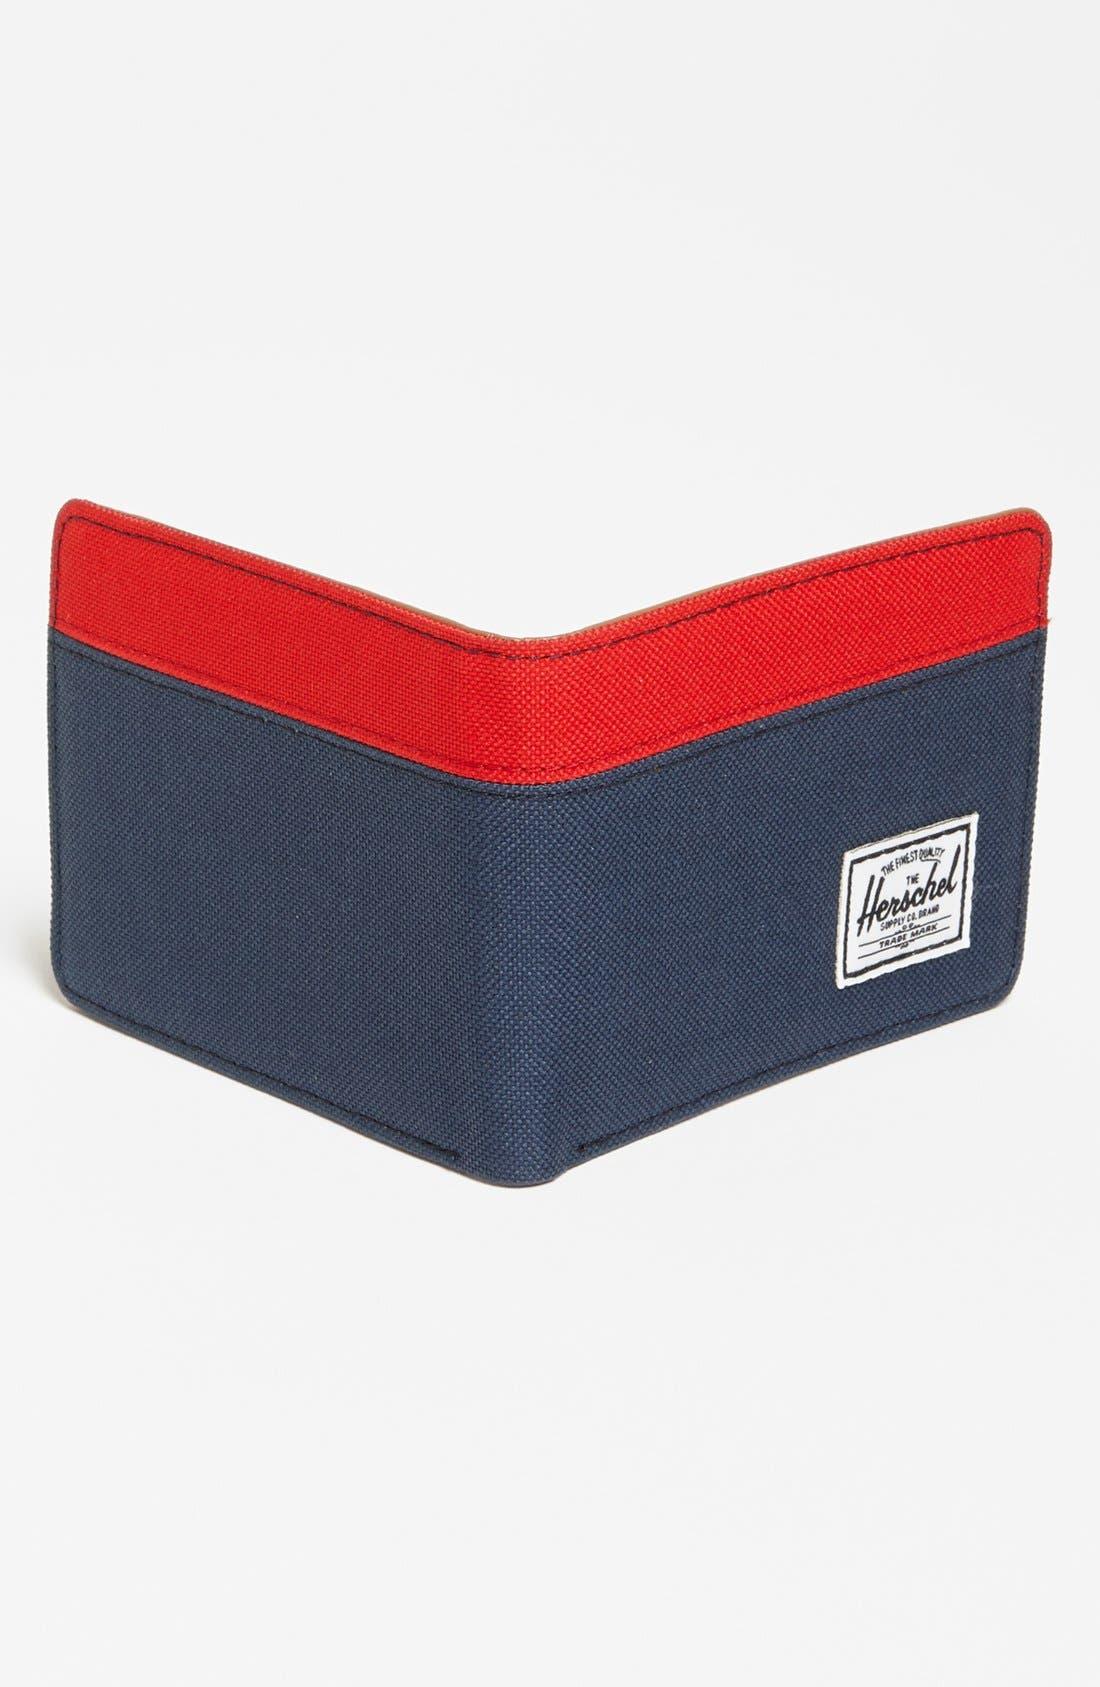 Alternate Image 3  - Herschel Supply Co. 'Hank' Bifold Wallet